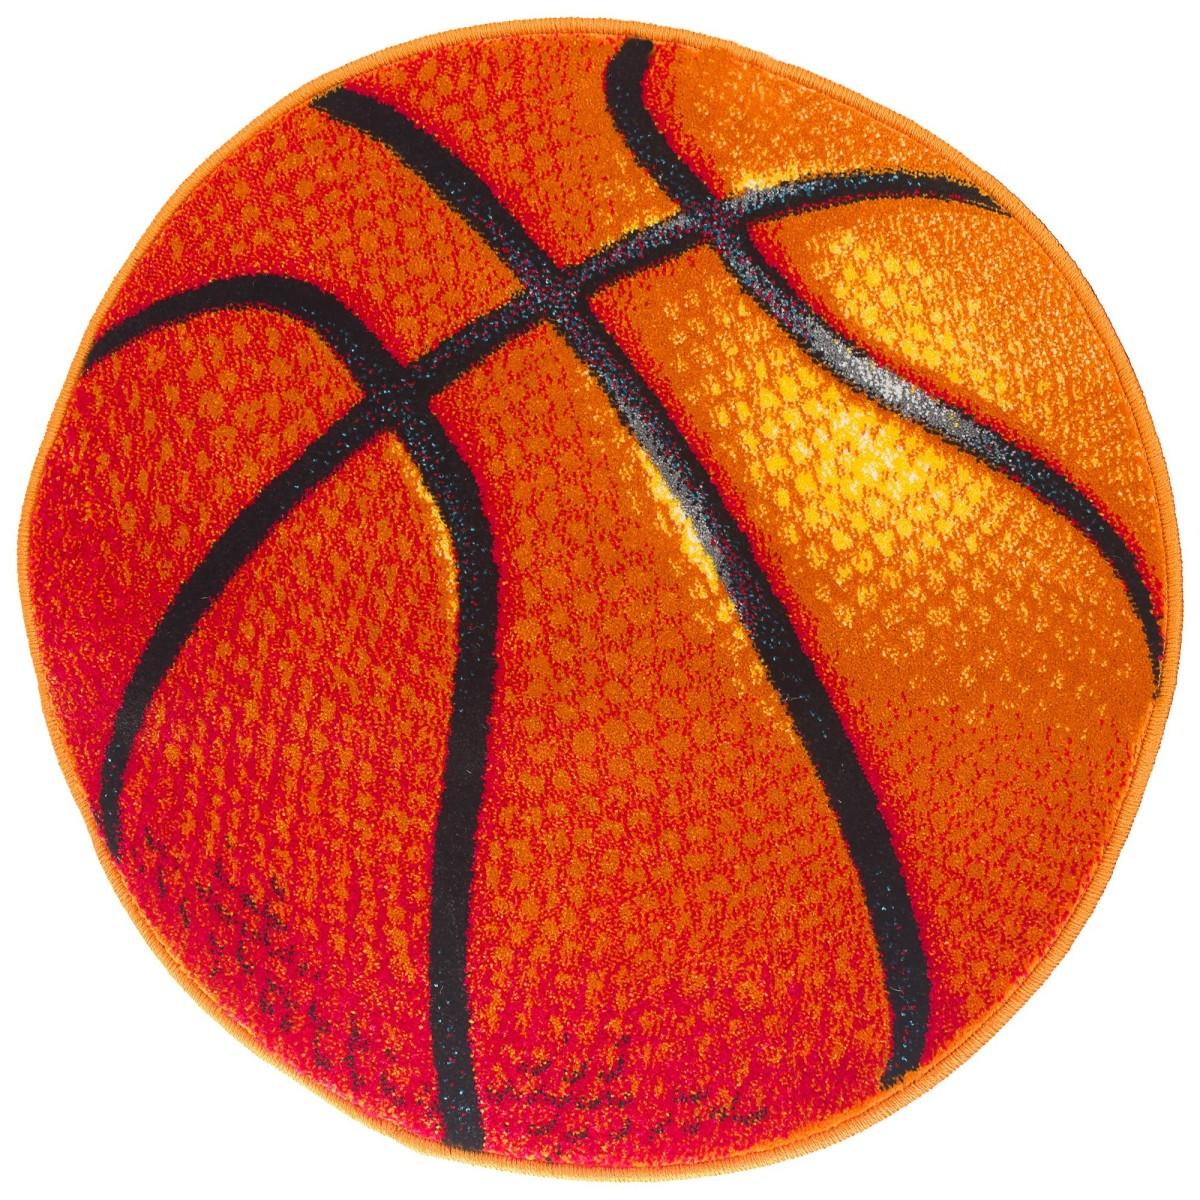 Ковер Мяч диаметр 08 м полипропилен